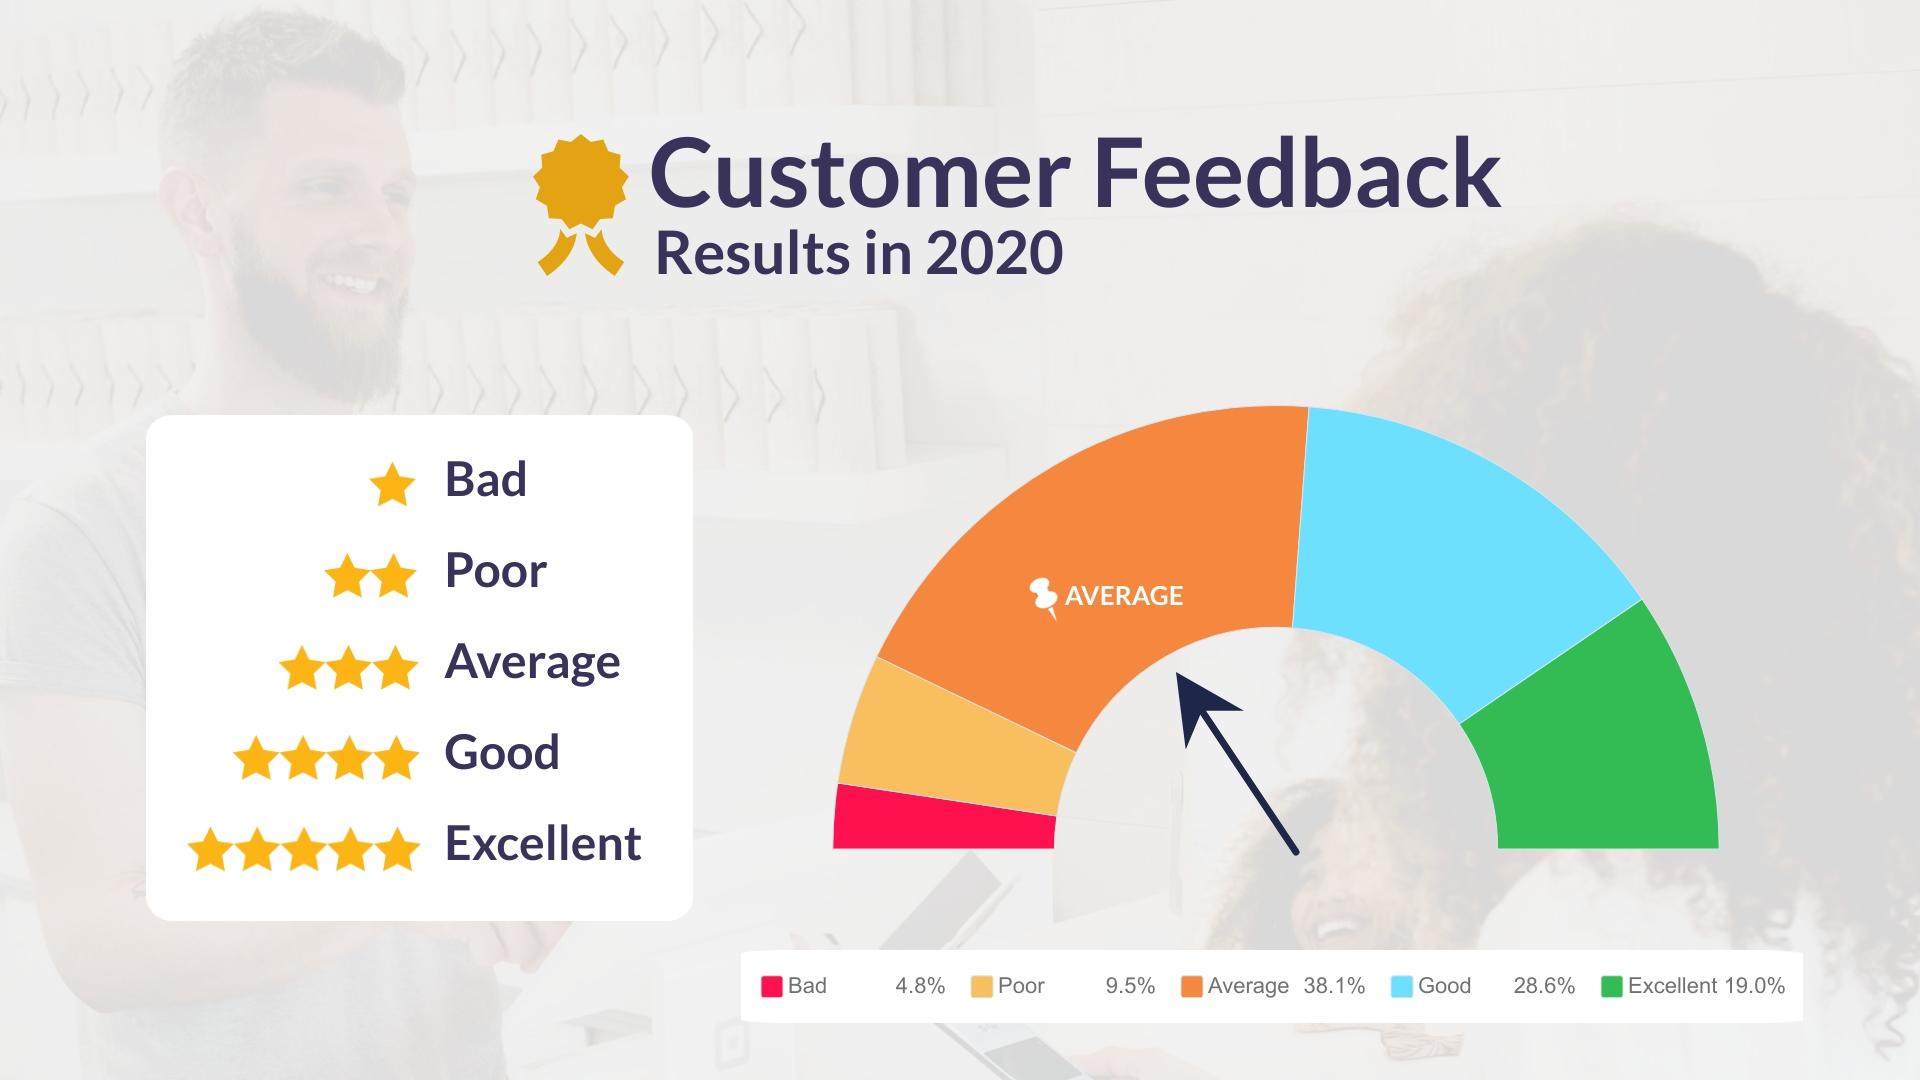 Customer Feedback - Gauge Chart Template